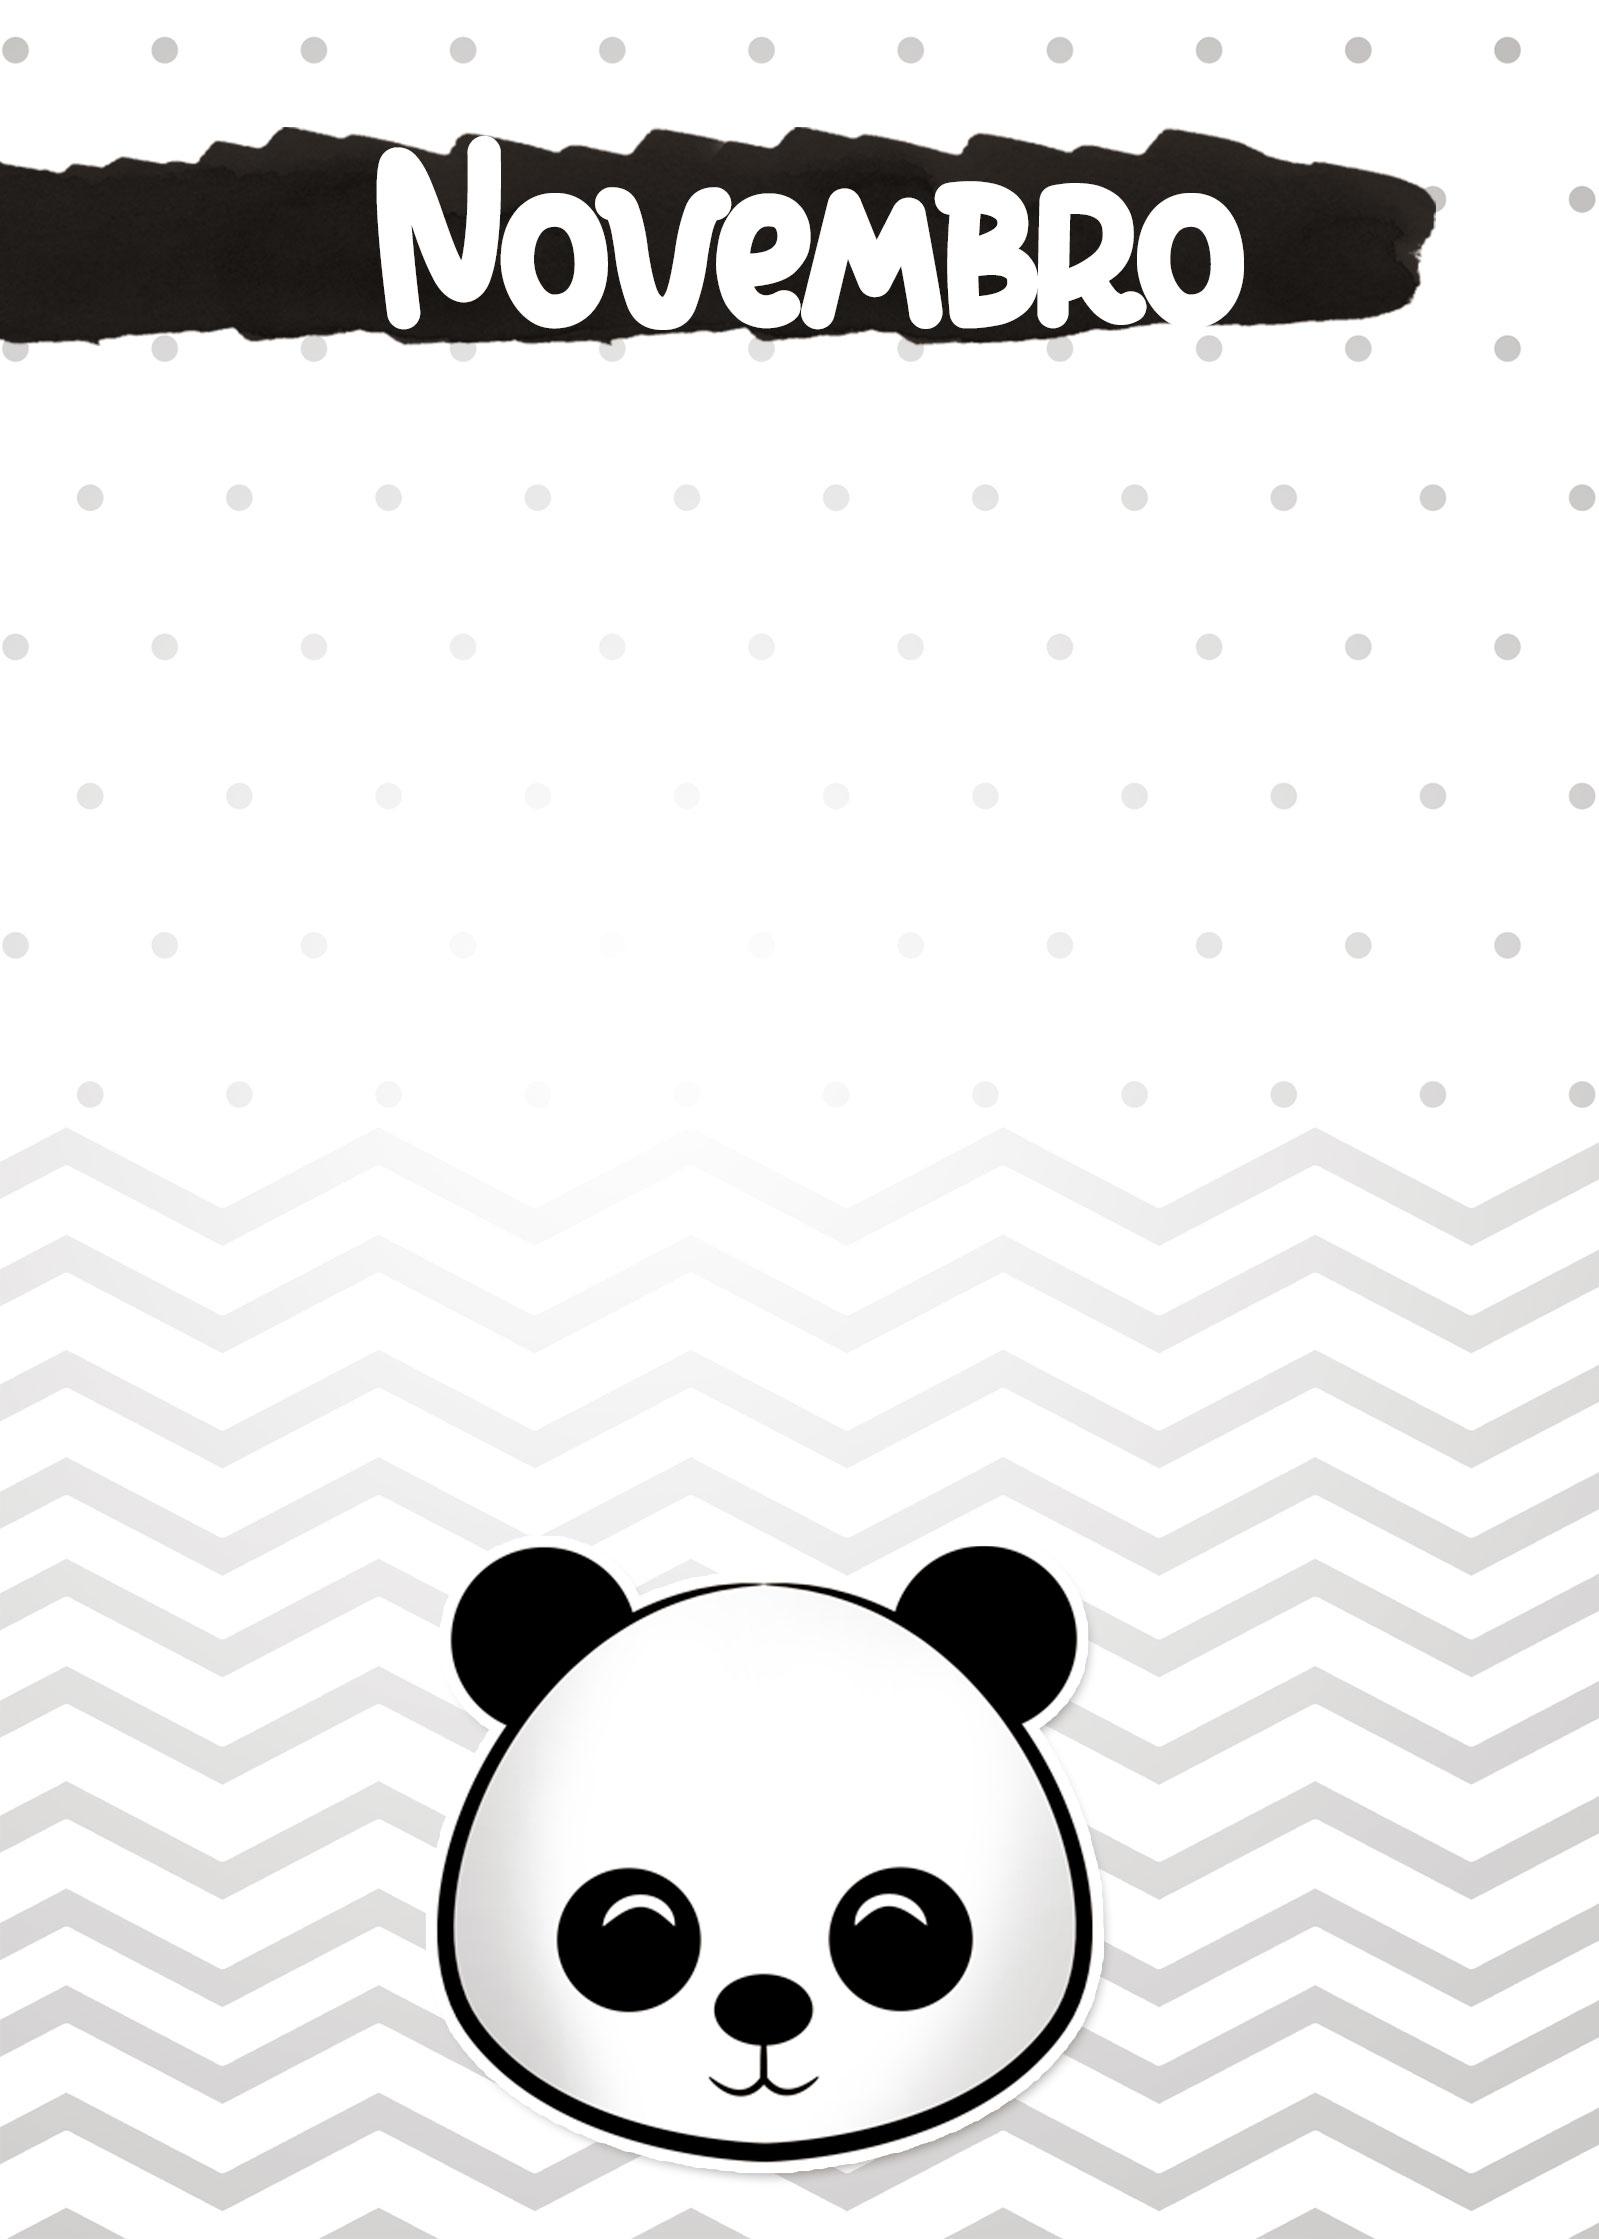 Planners 2019 Panda Menino capa novembro